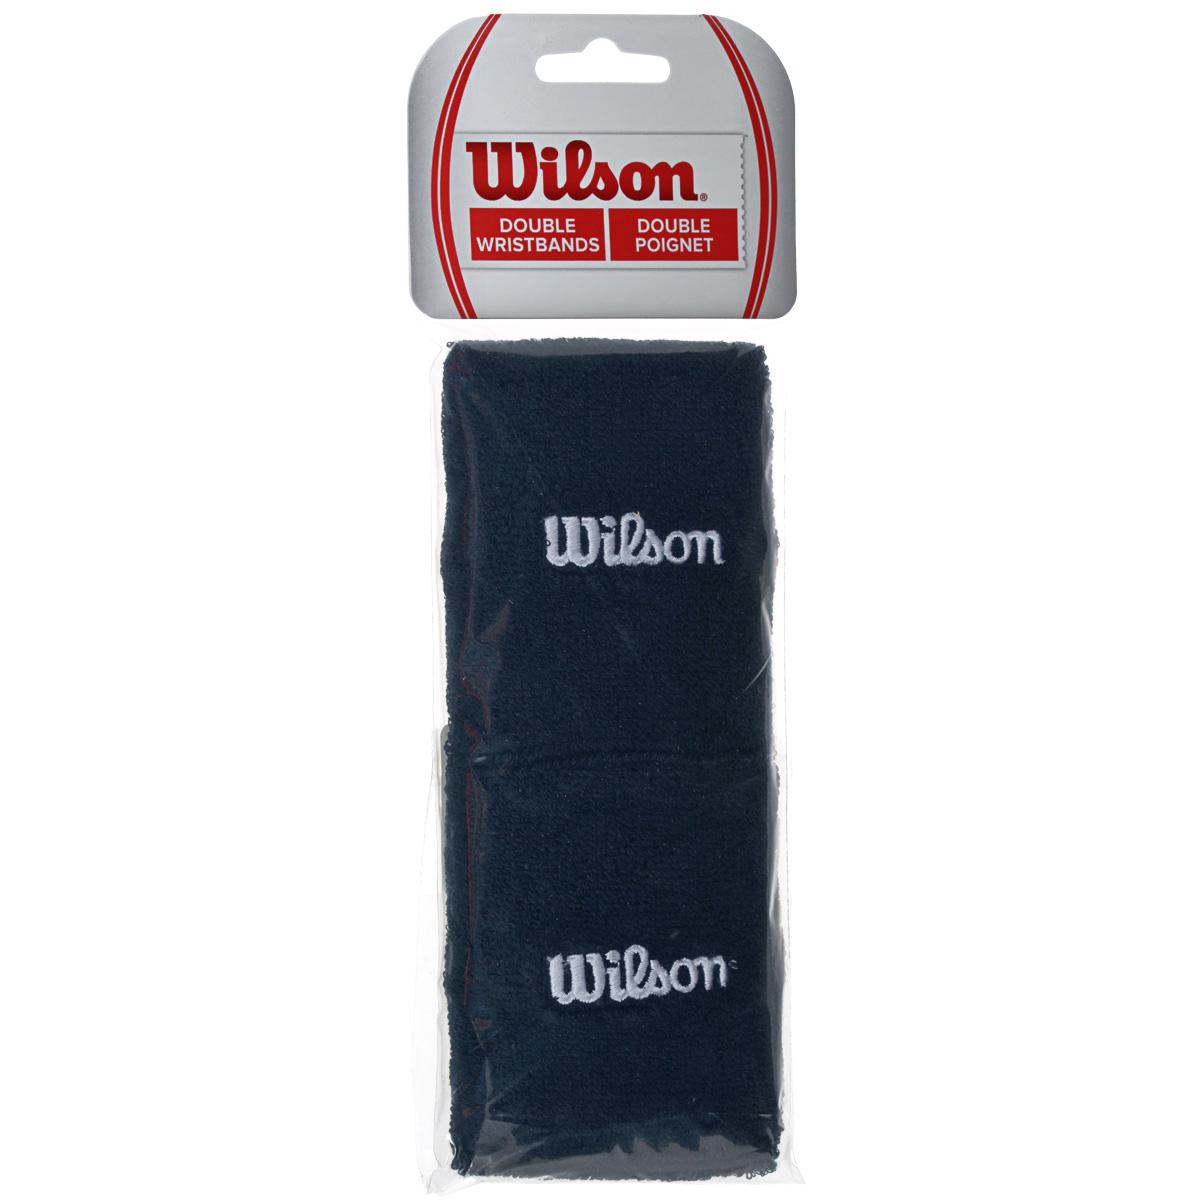 "Wilson Напульсник Wilson ""Double Wristband"", цвет: черный, 2 шт. Размер универсальный"